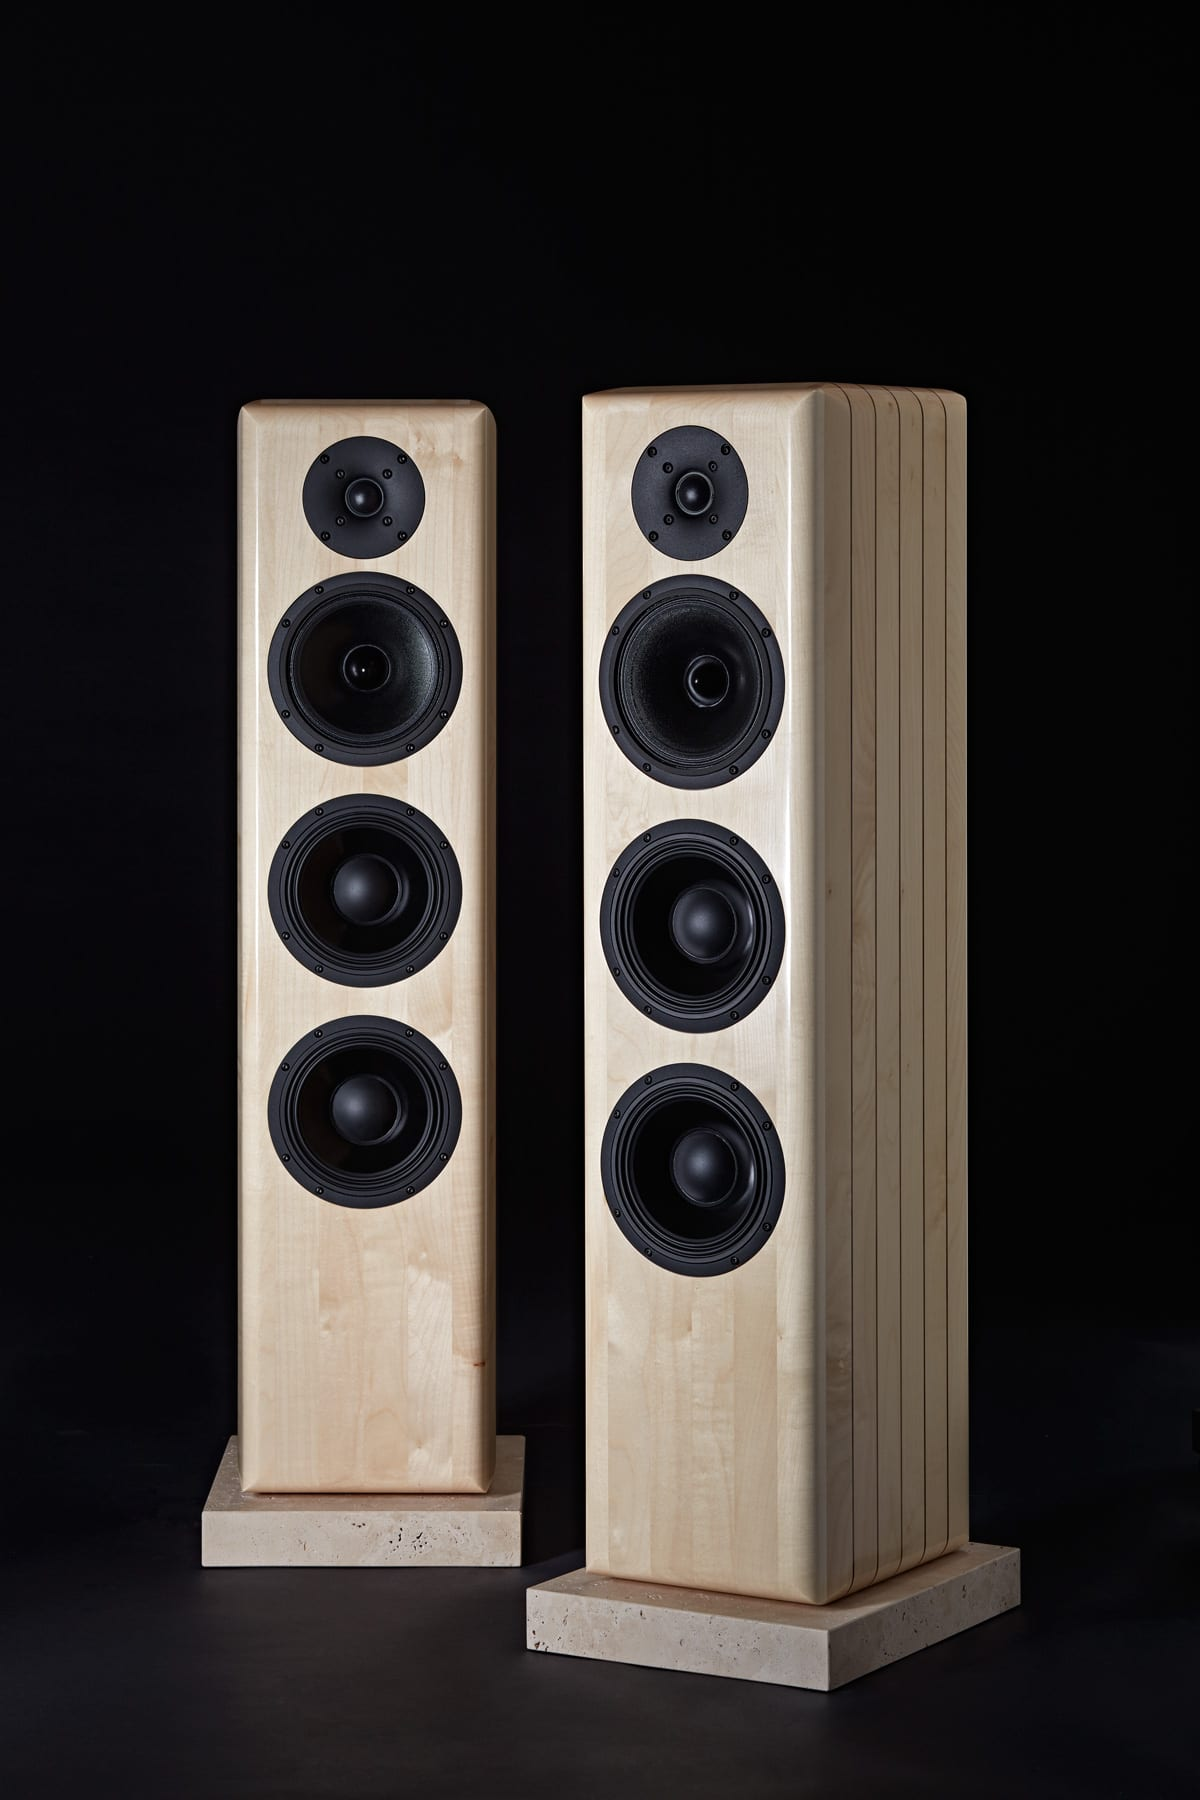 Xavian Calliope Speakers Floorstander Designs On A Firm